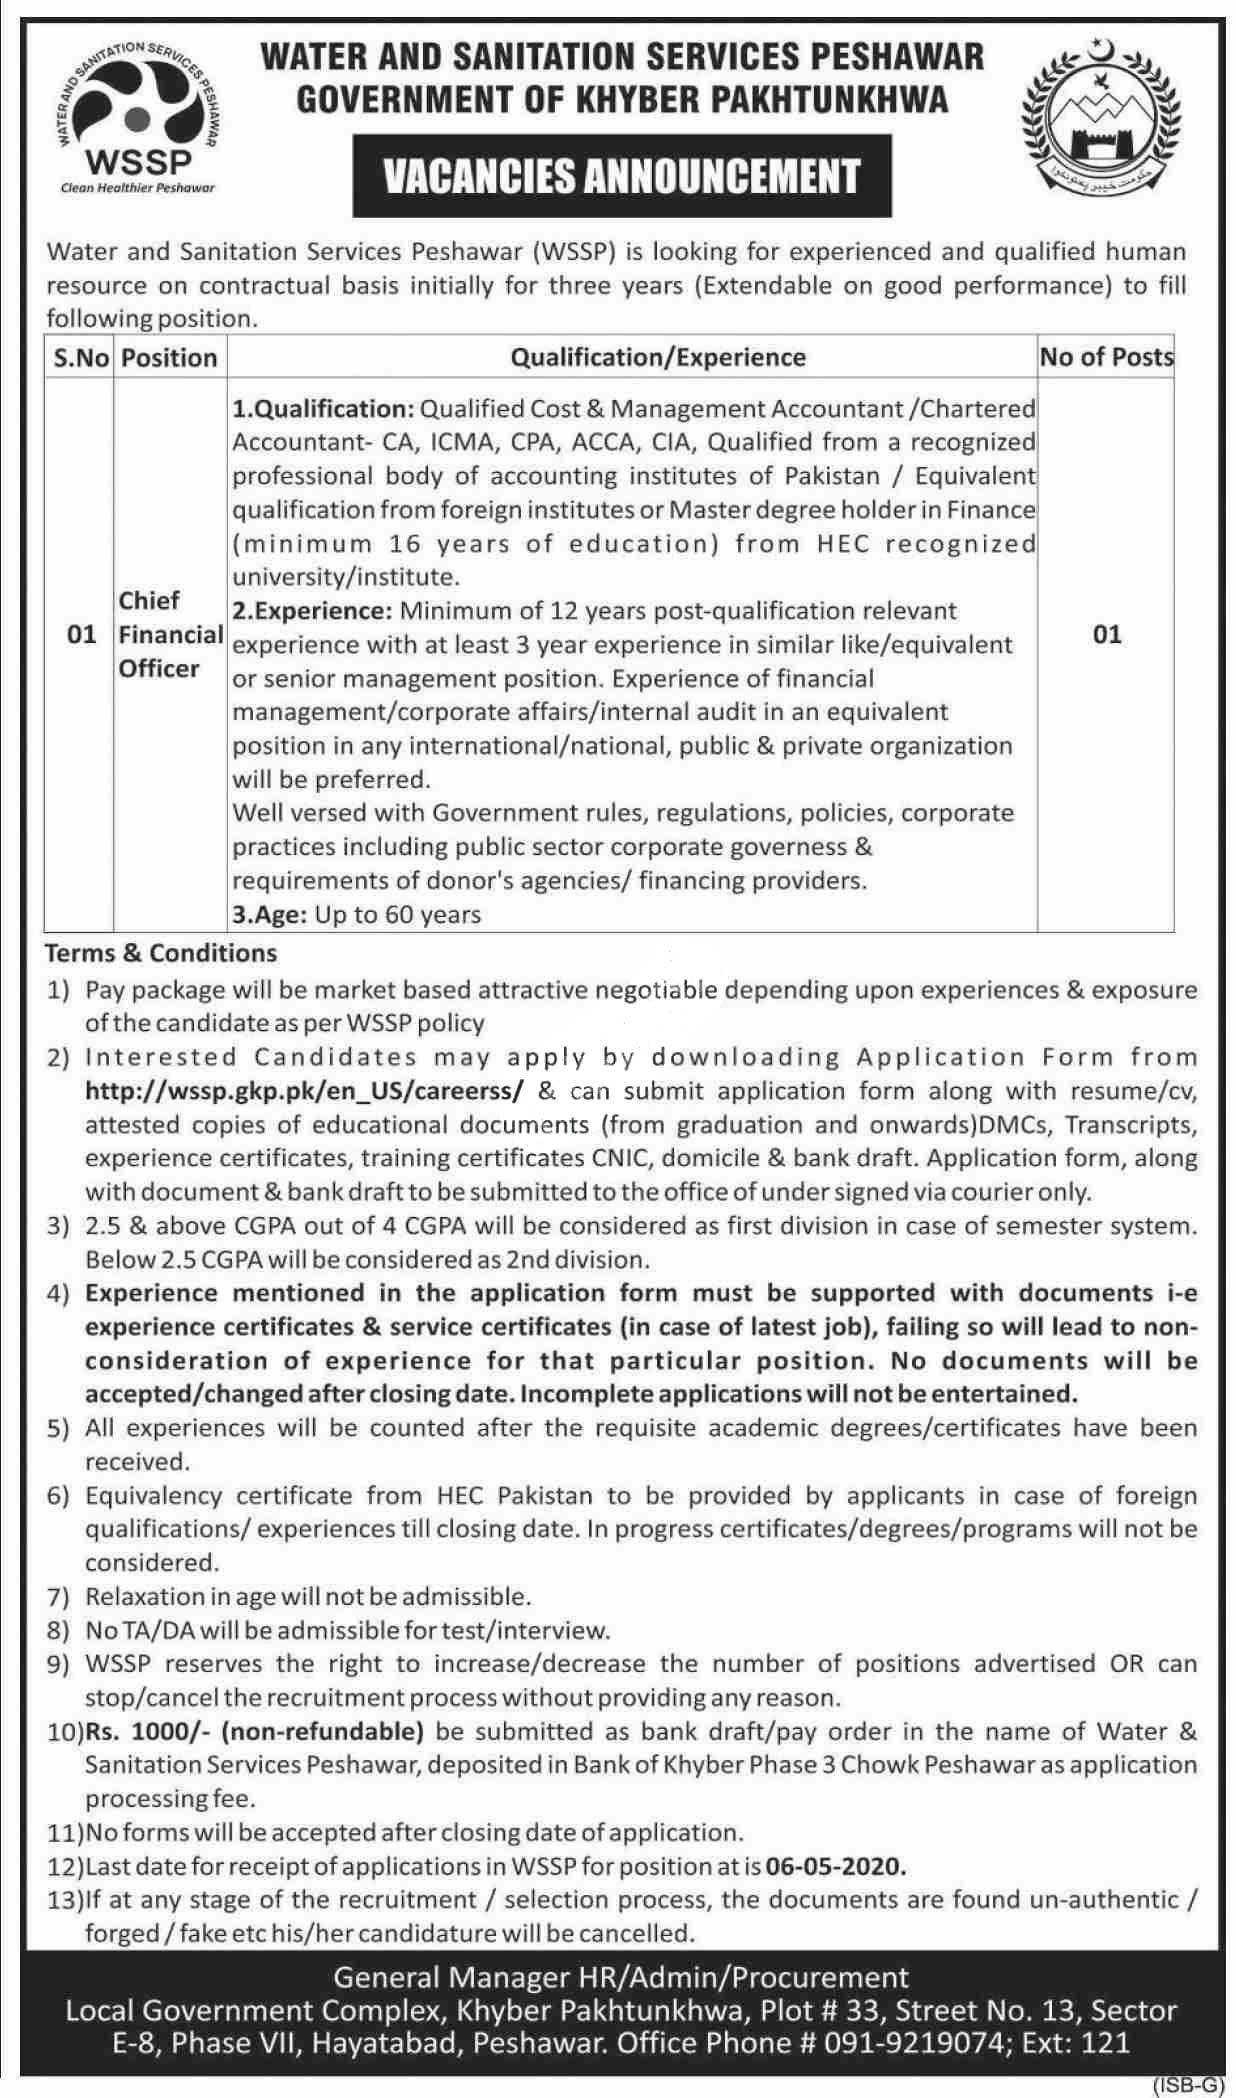 Water & Sanitation Services Peshawar Wssp Jobs 2020 Latest